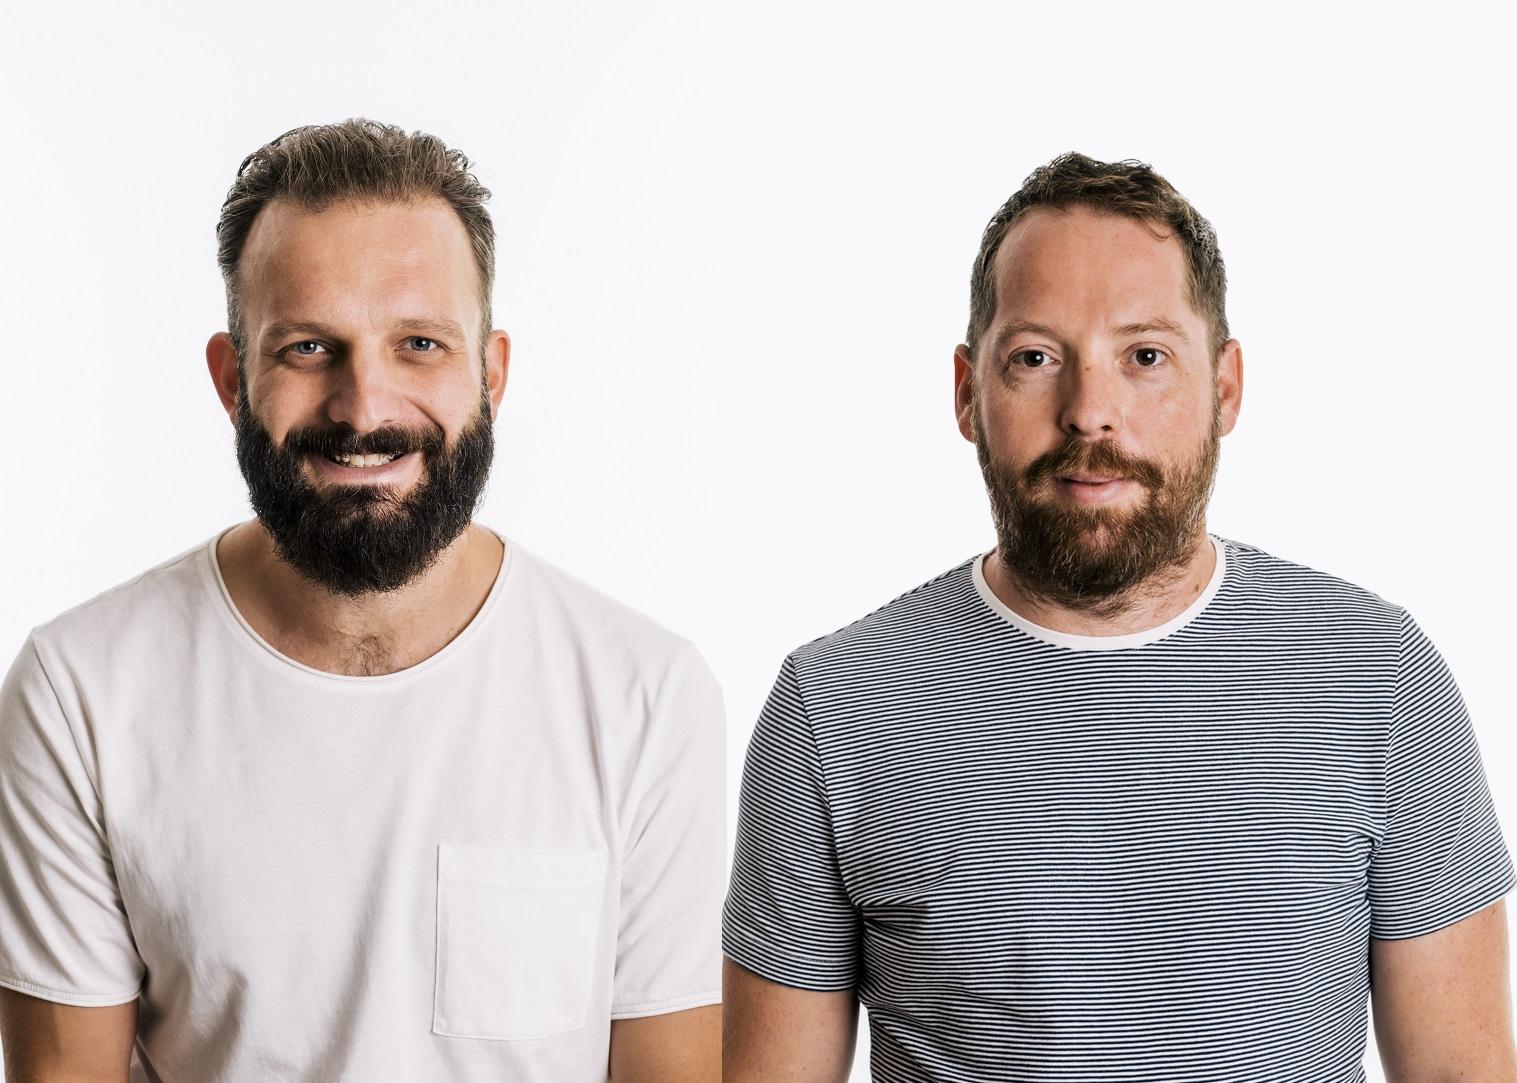 Spoluzakladatelé Virtooal, Ondřej Bagin a Peter Soós